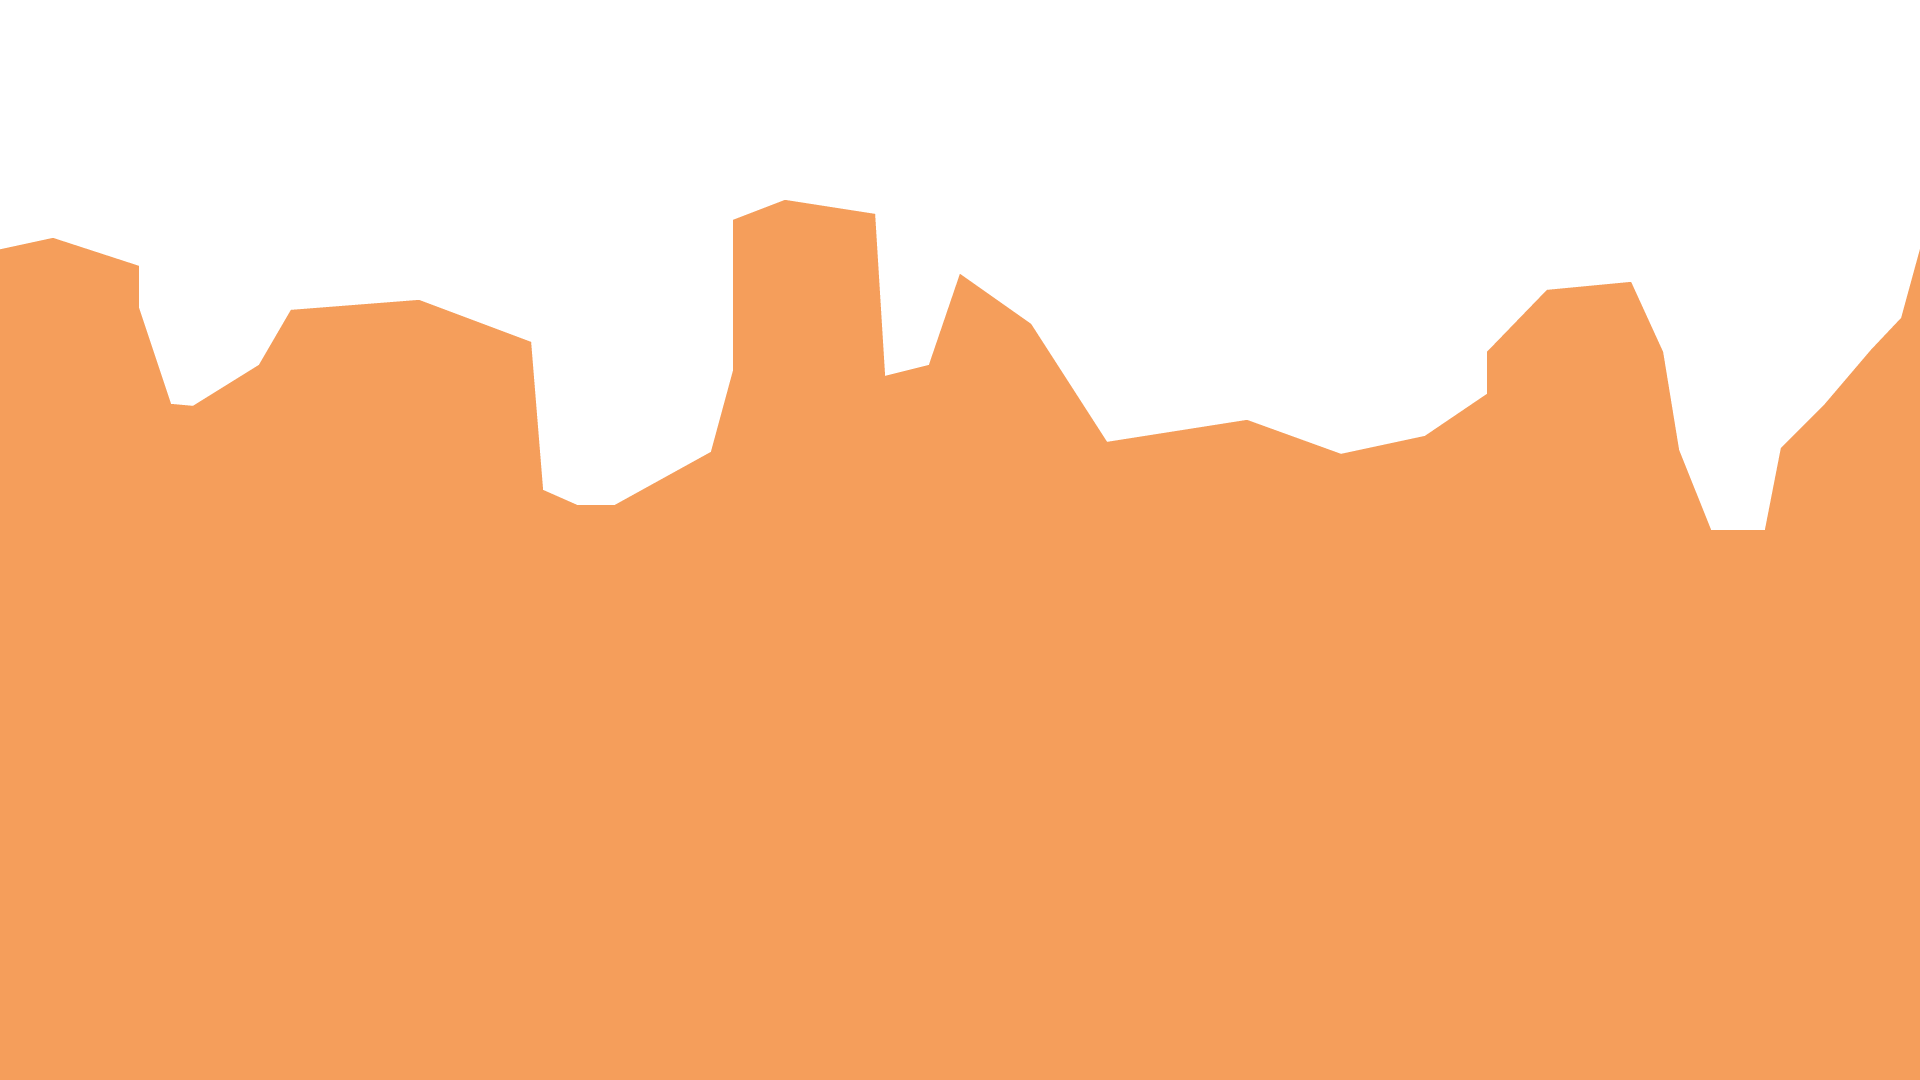 Desert clipart desert landform. Parallax background by cryptogene